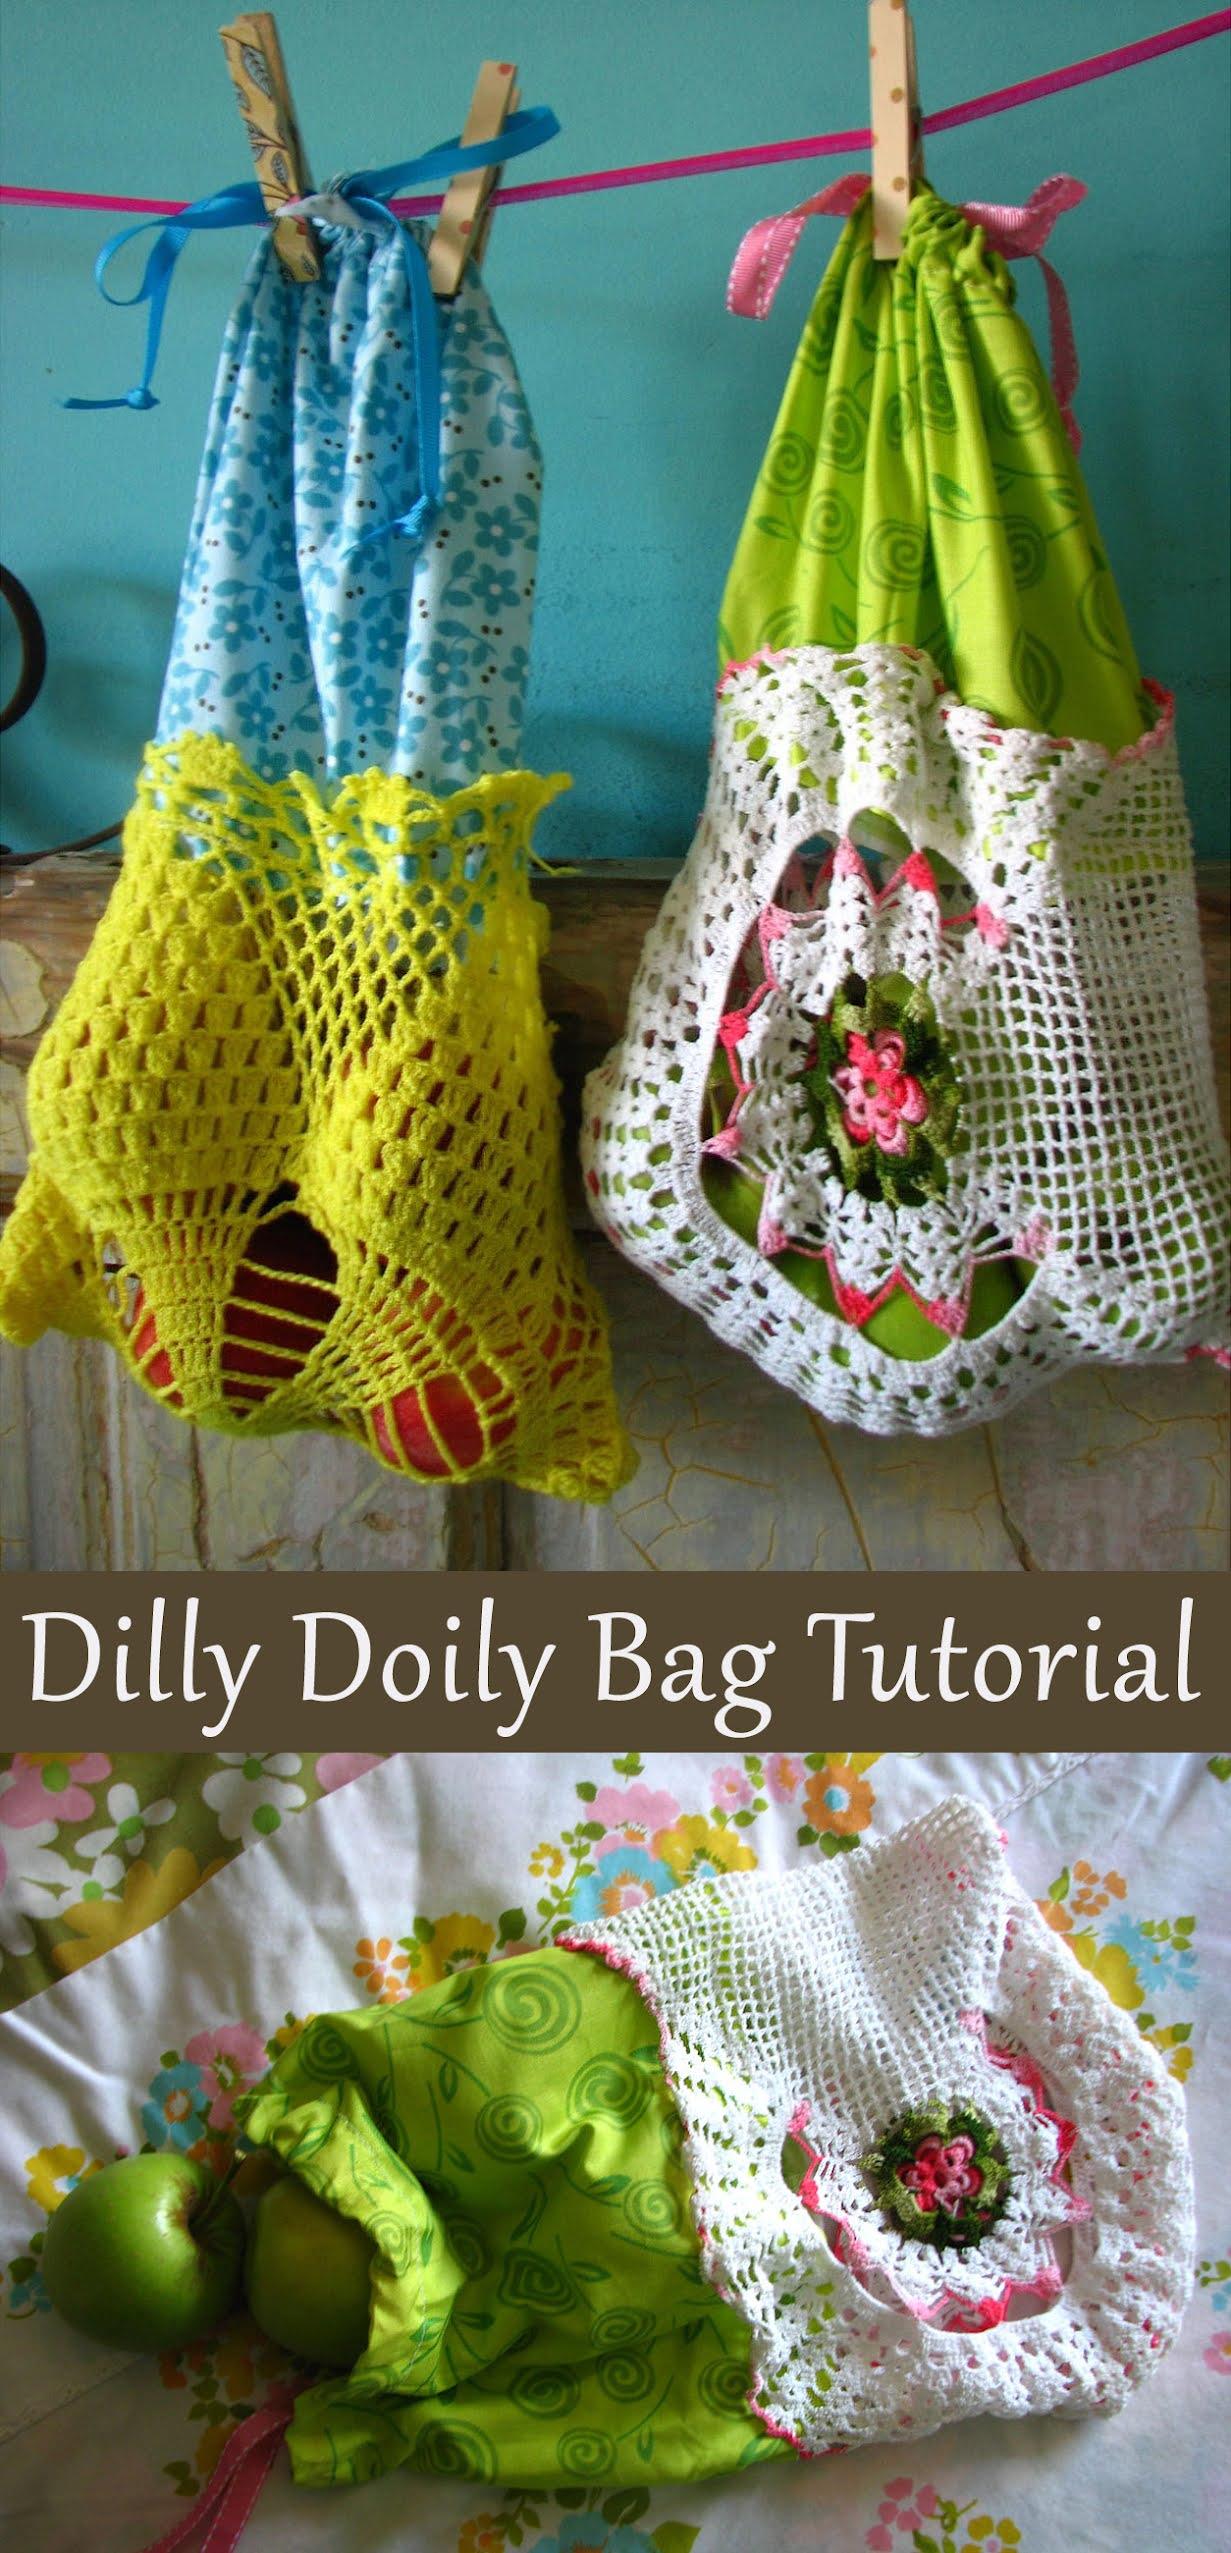 Dilly Doily Bag Tutorial